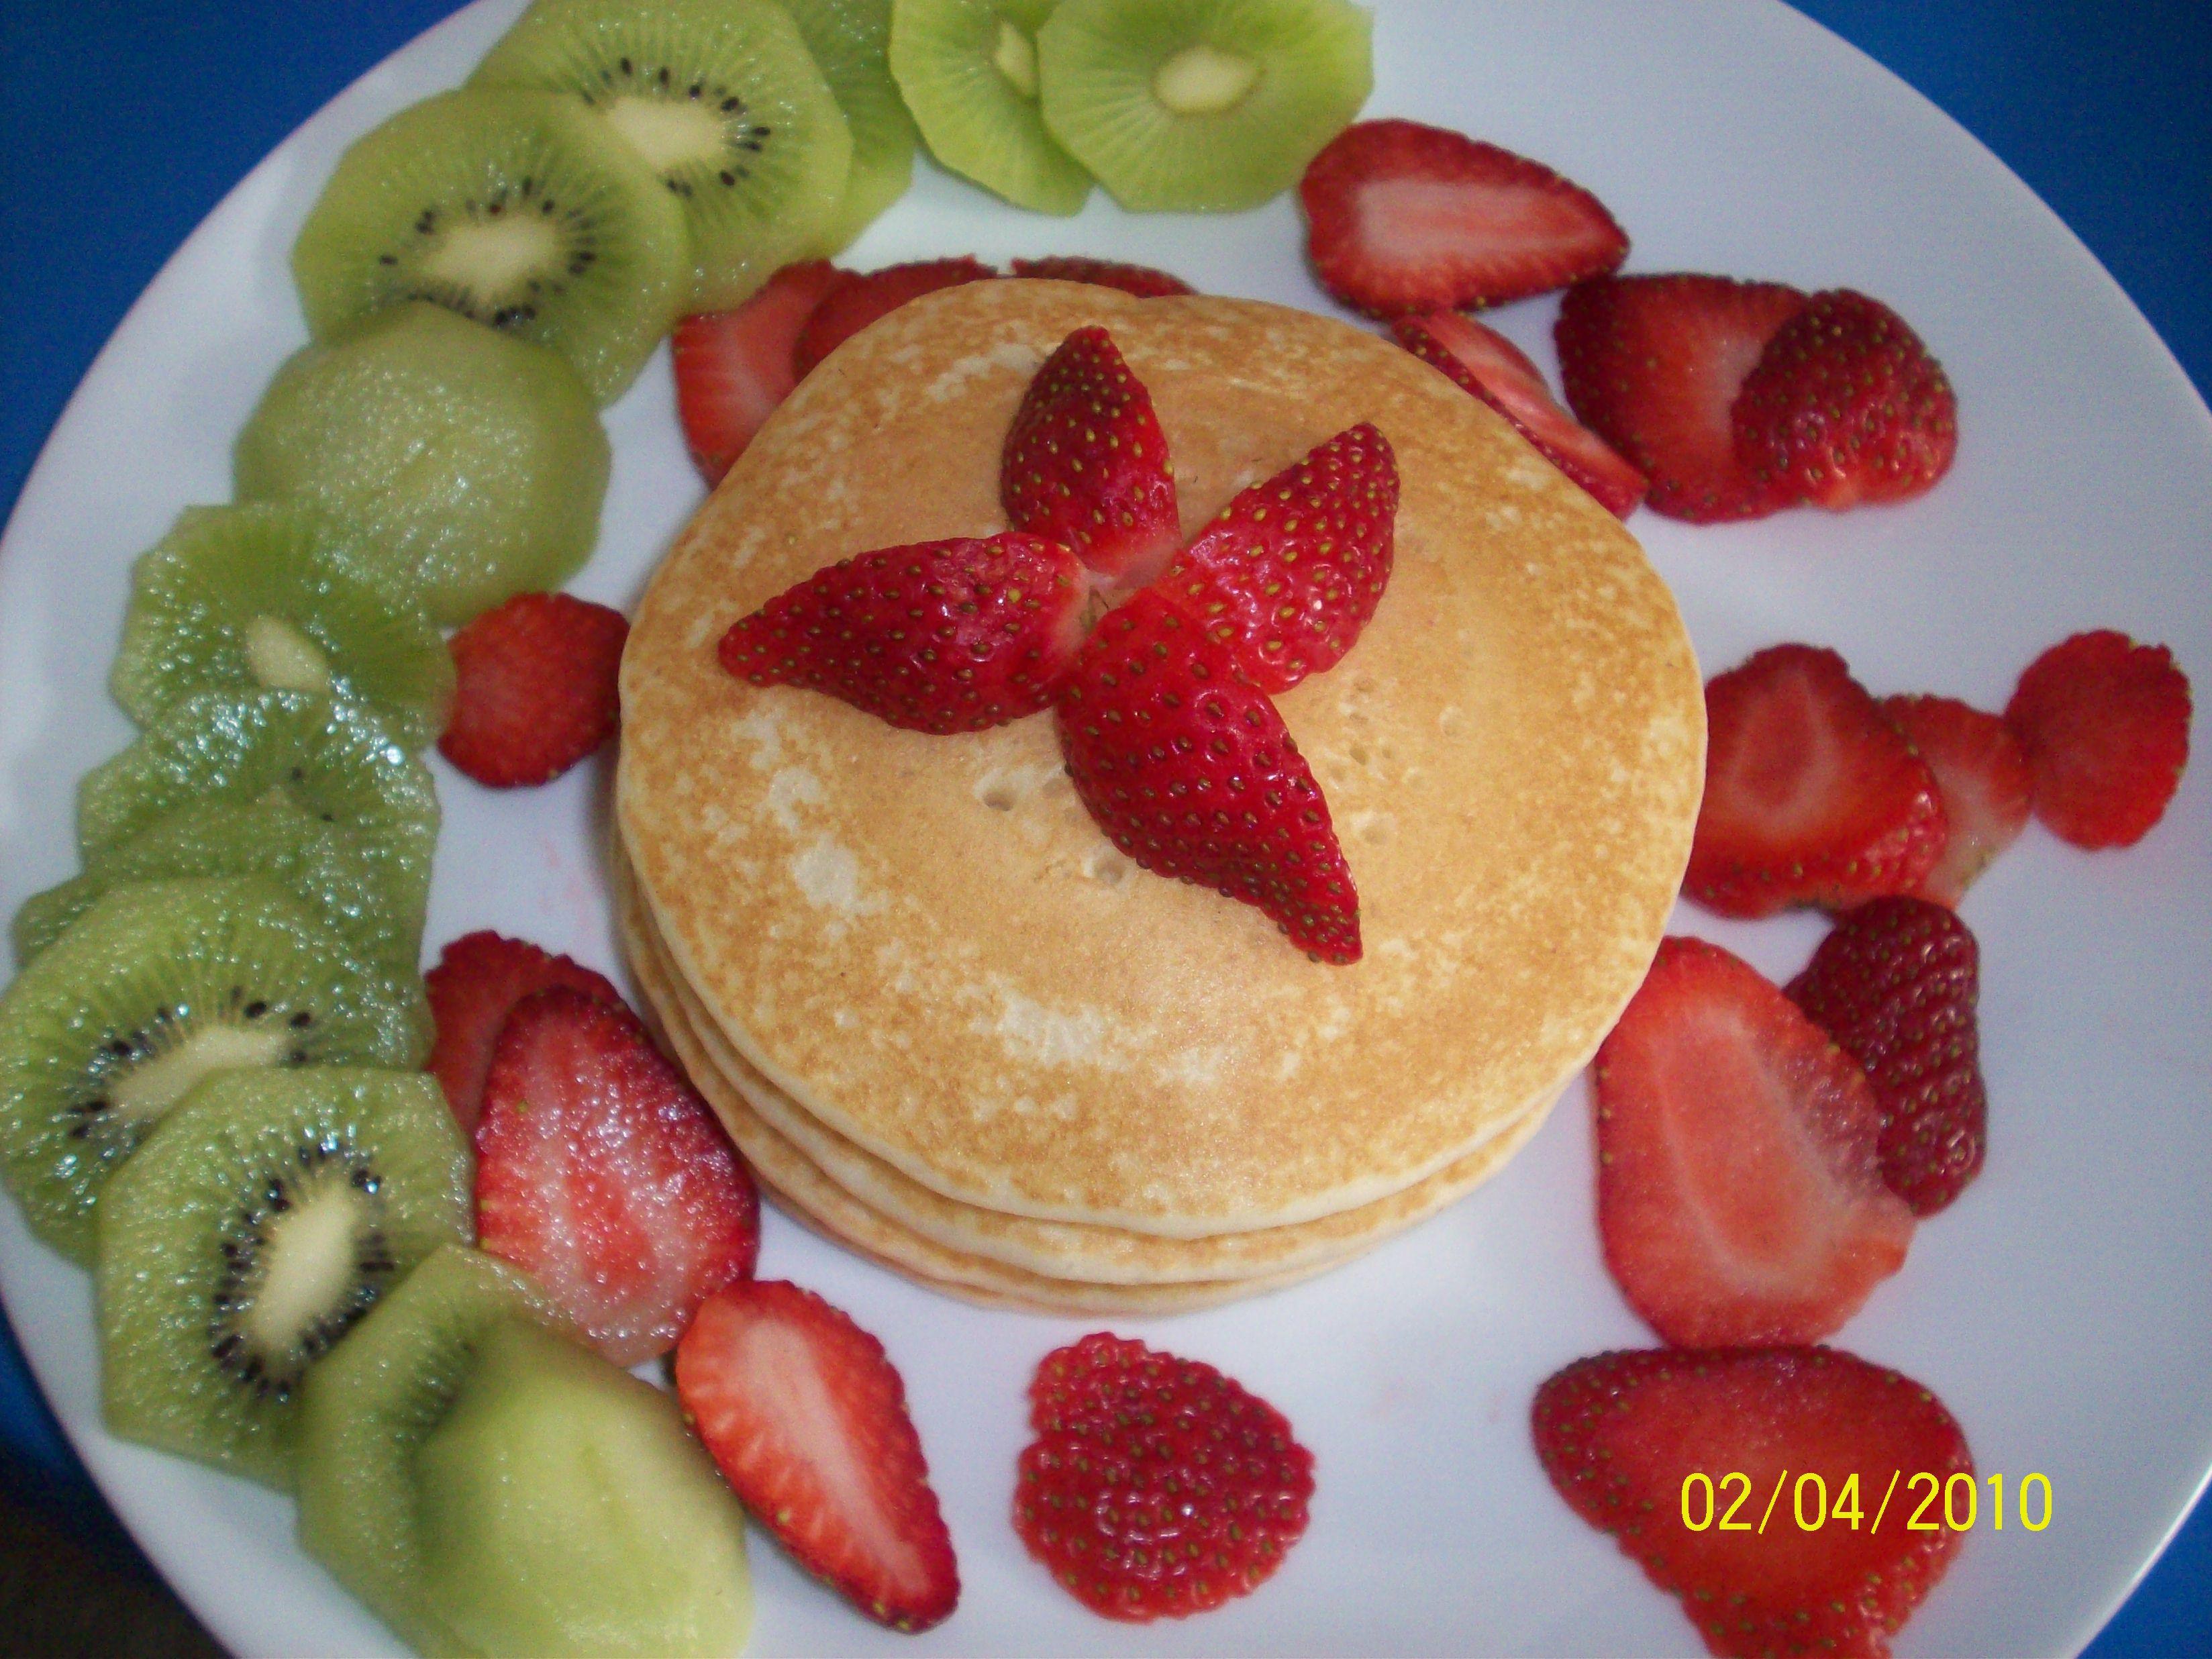 http://foodloader.net/cutie_2010-04-02_Pancakes.jpg